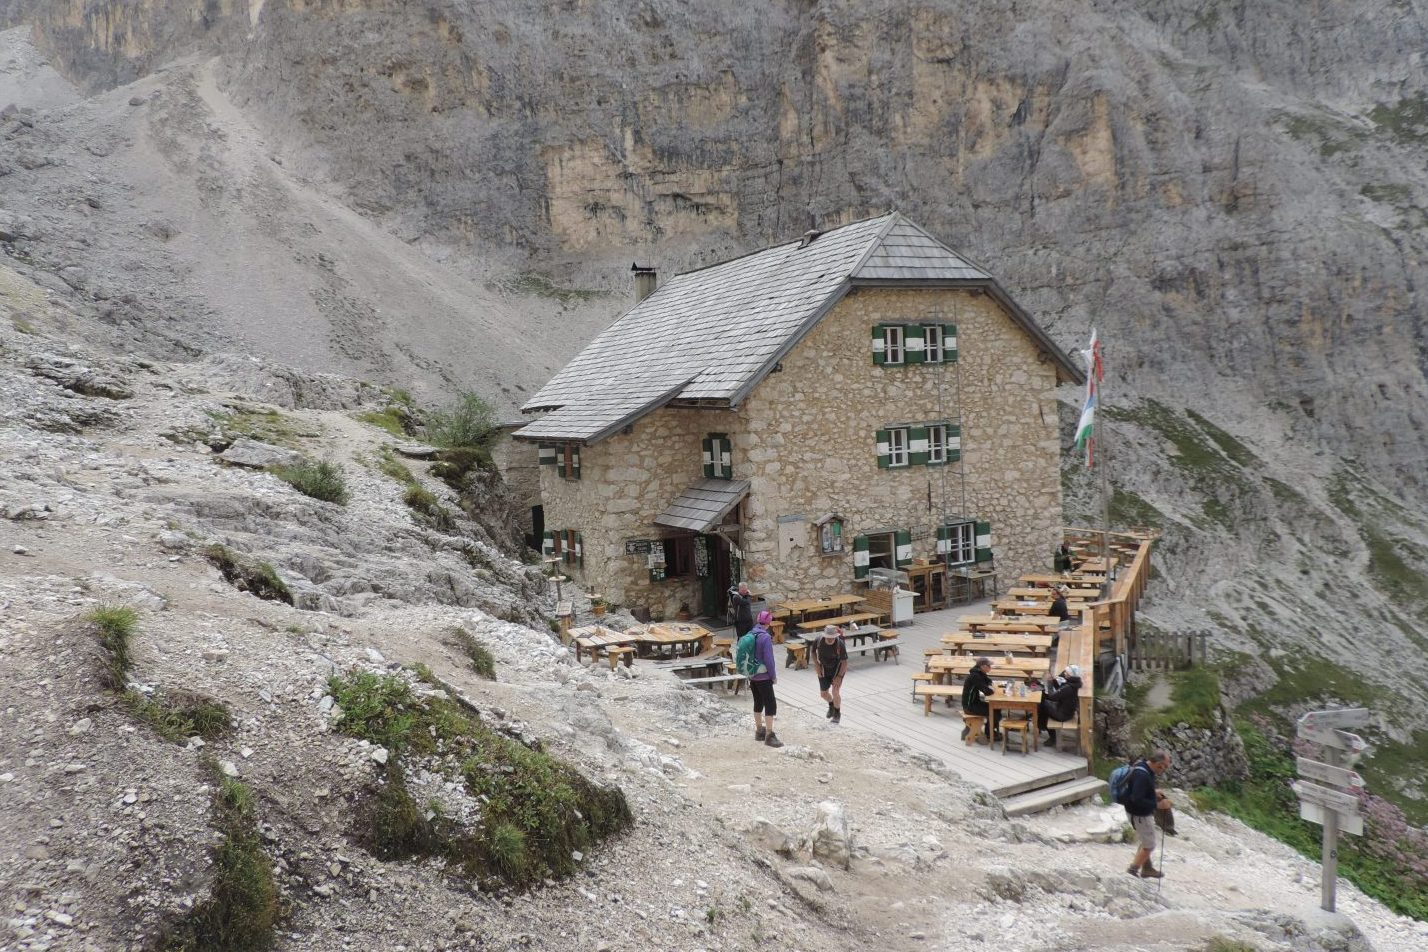 image: a great refuge at the base of sassolungo